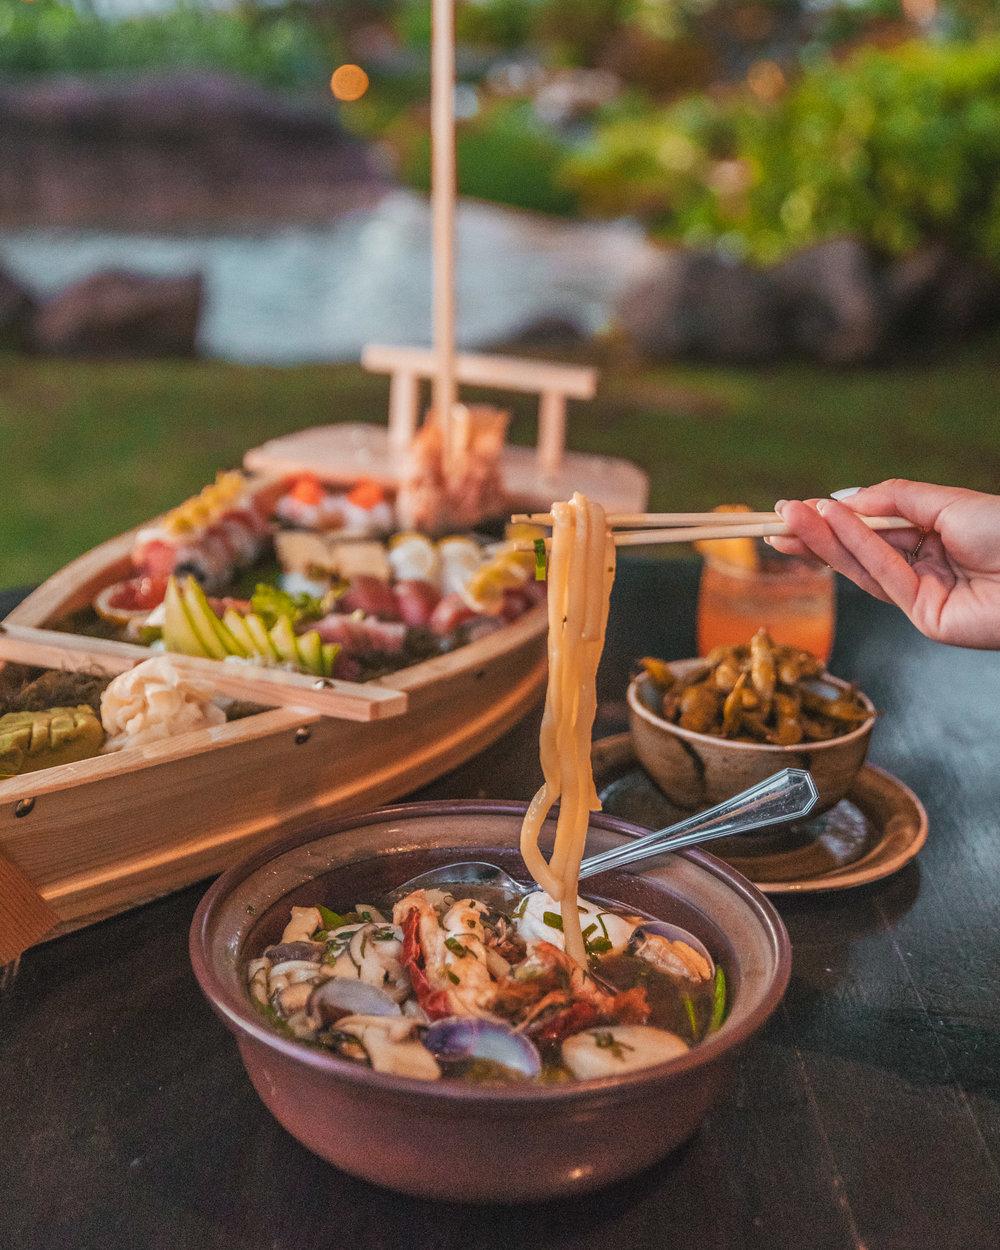 Ramen and sushi boat at Japengo, Hyatt Regency Maui // The Quick Guide to Visiting Maui, Hawaii #readysetjetset #hawaii #maui